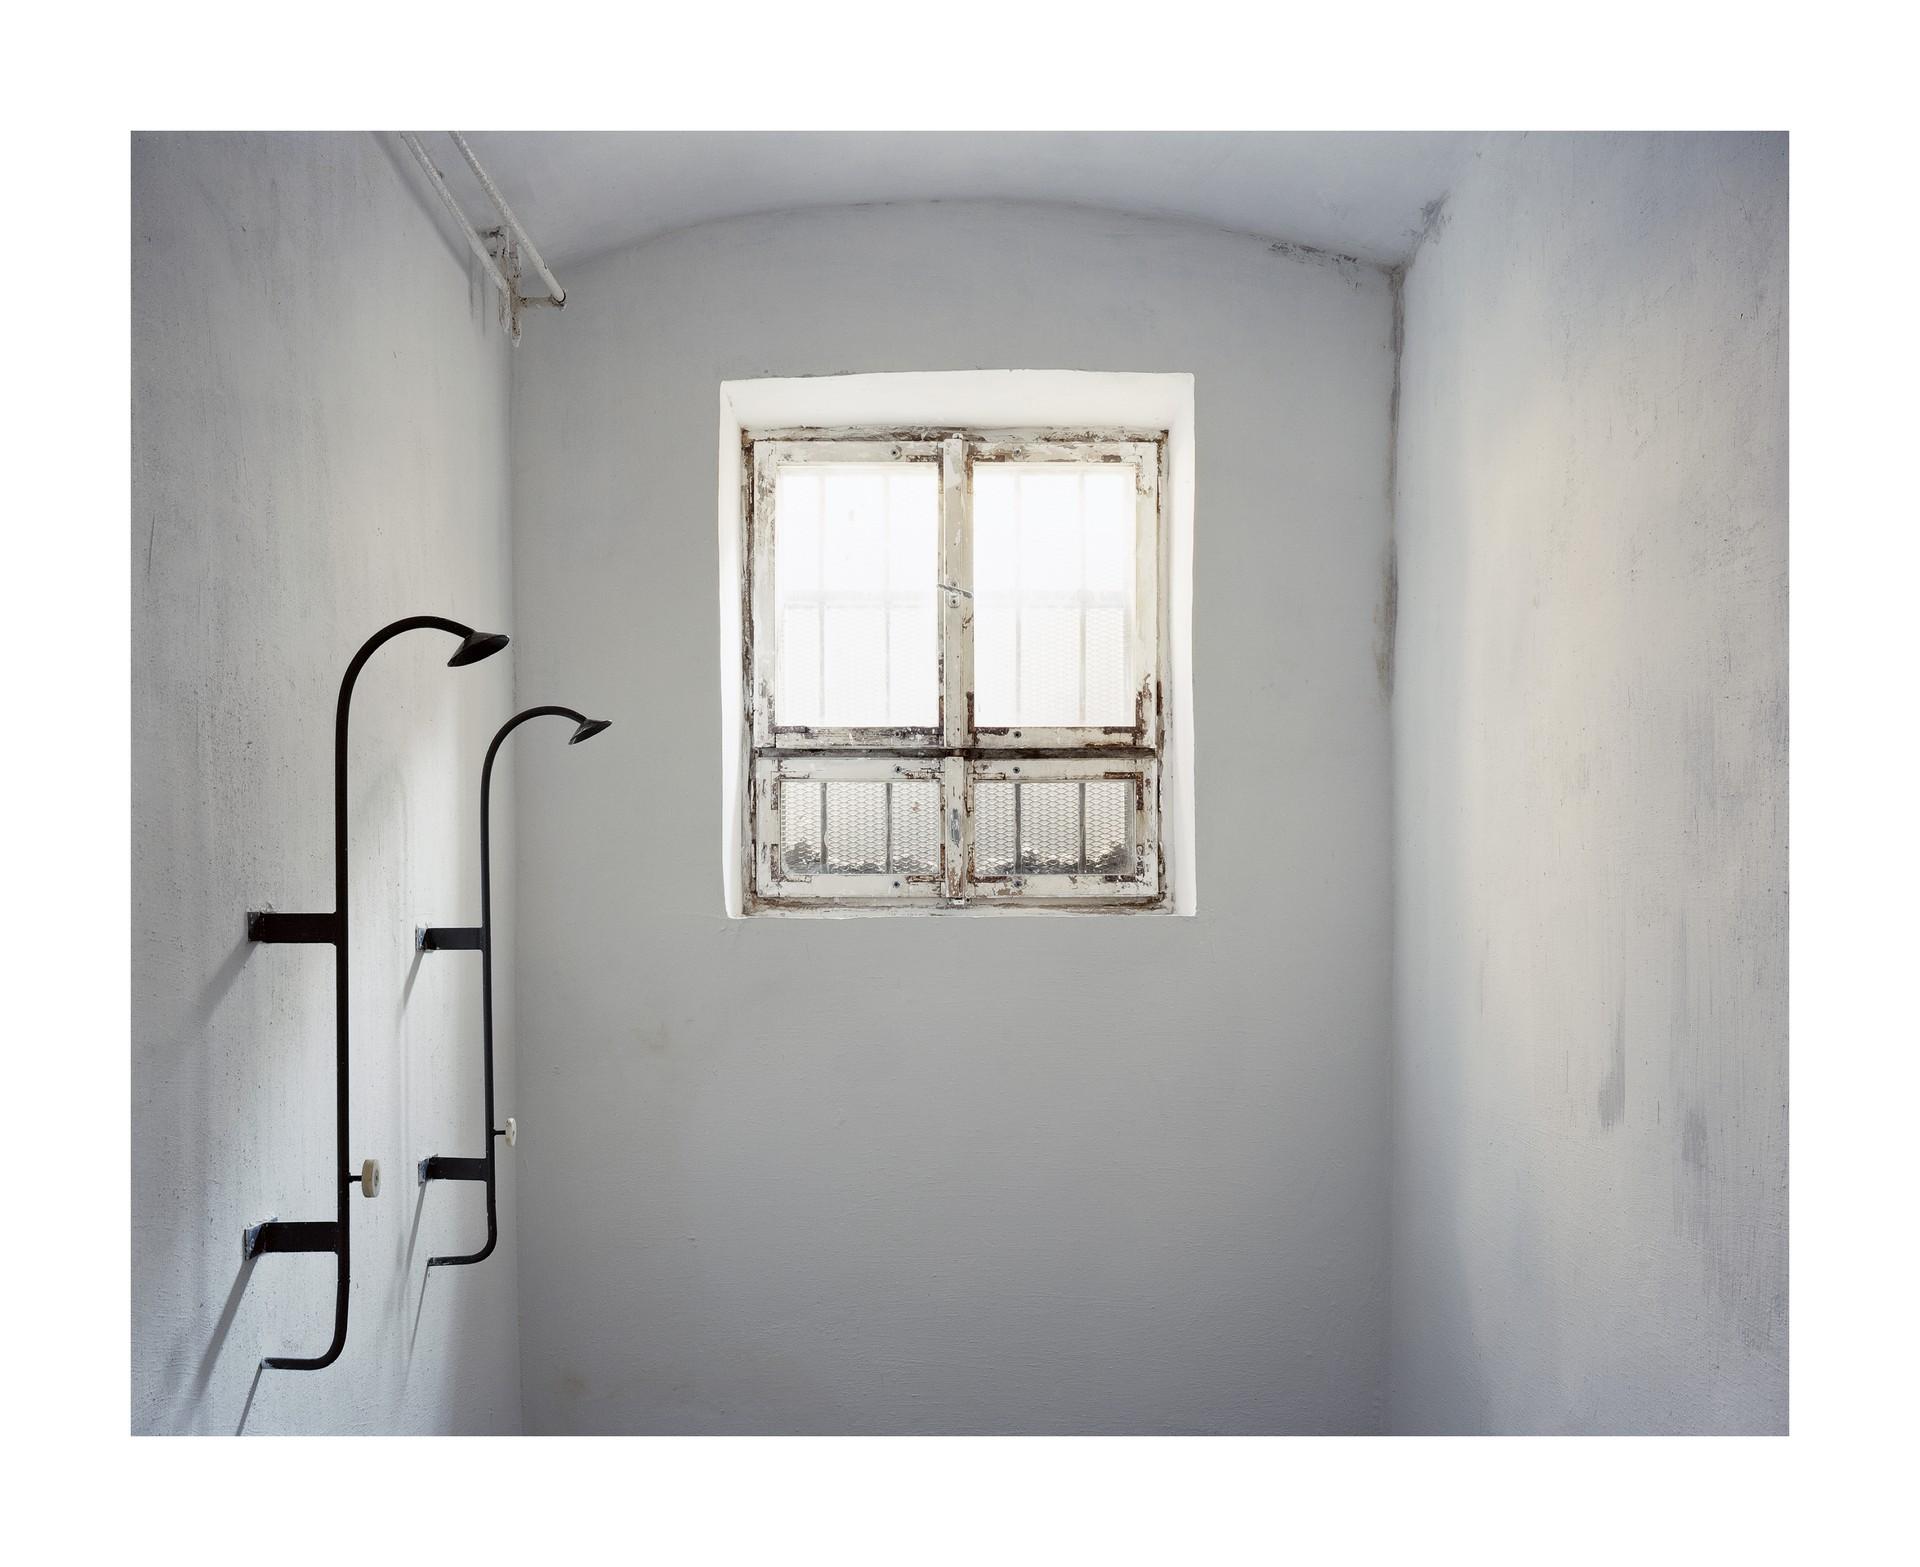 Fotó: Kovalovszky Dániel: Zuhanyzó a Kisfogházban.